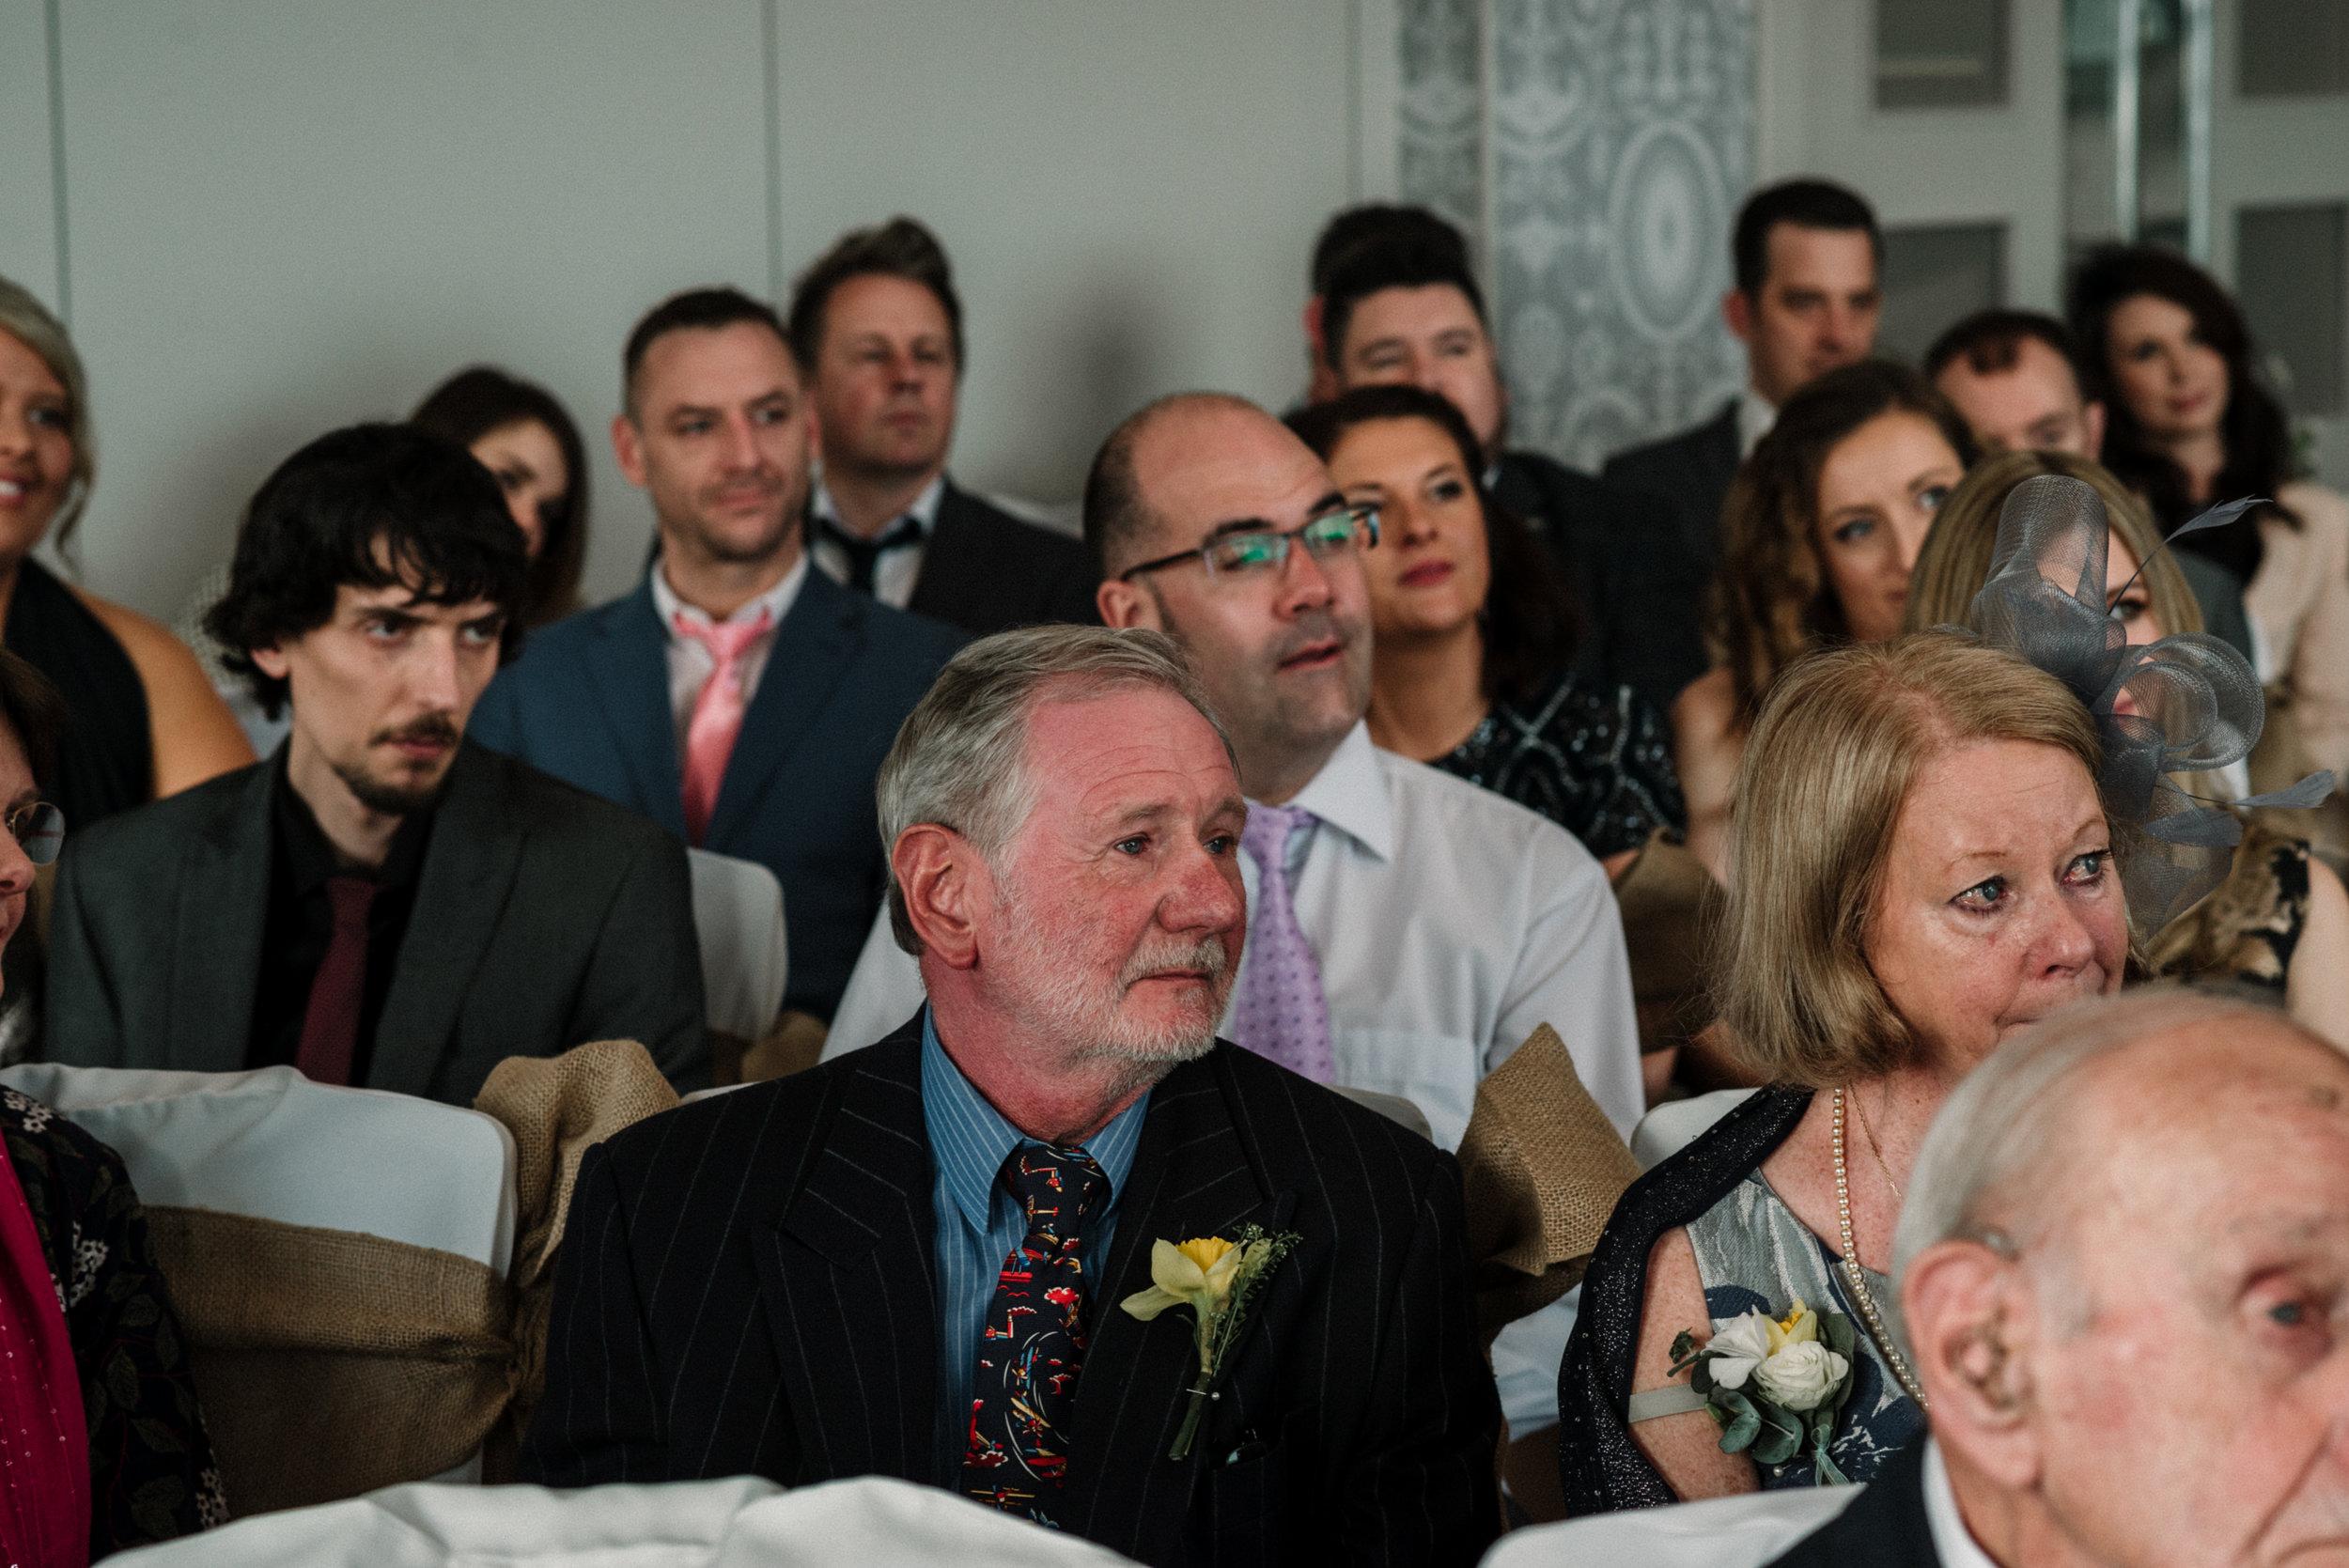 wales-wedding-photographer (30).jpg